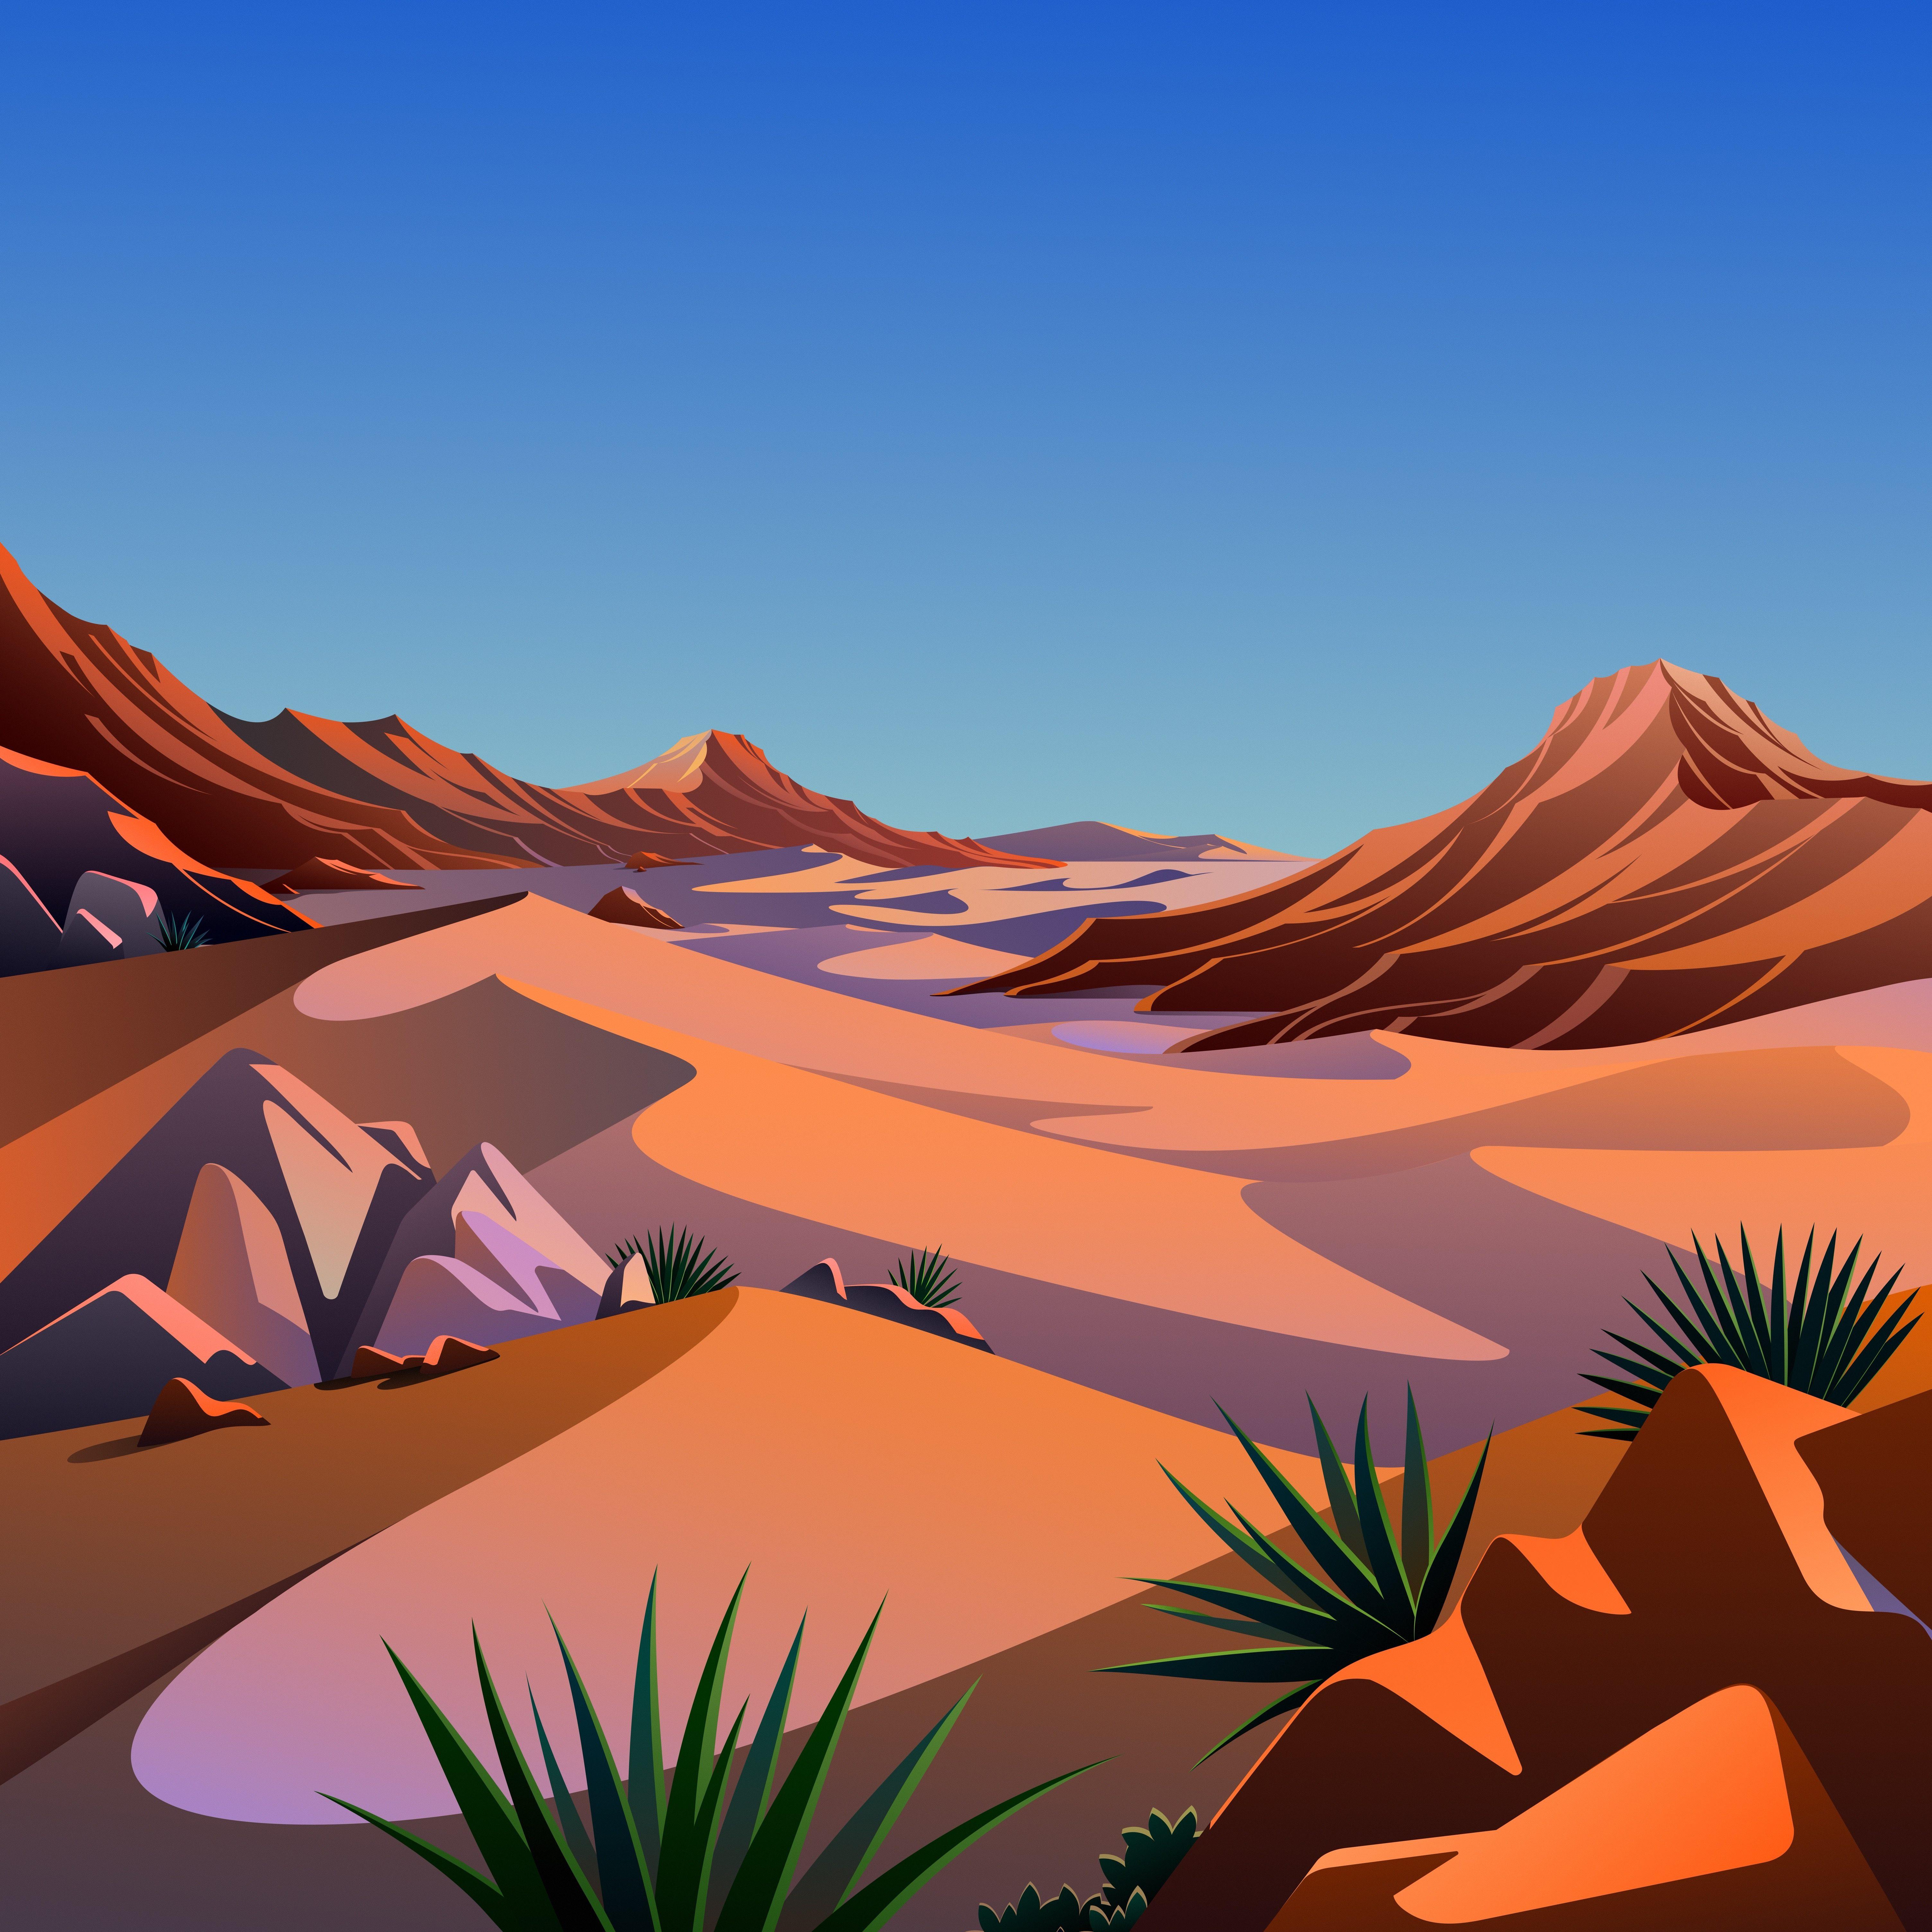 macOS Big Sur The Desert 5 dragged